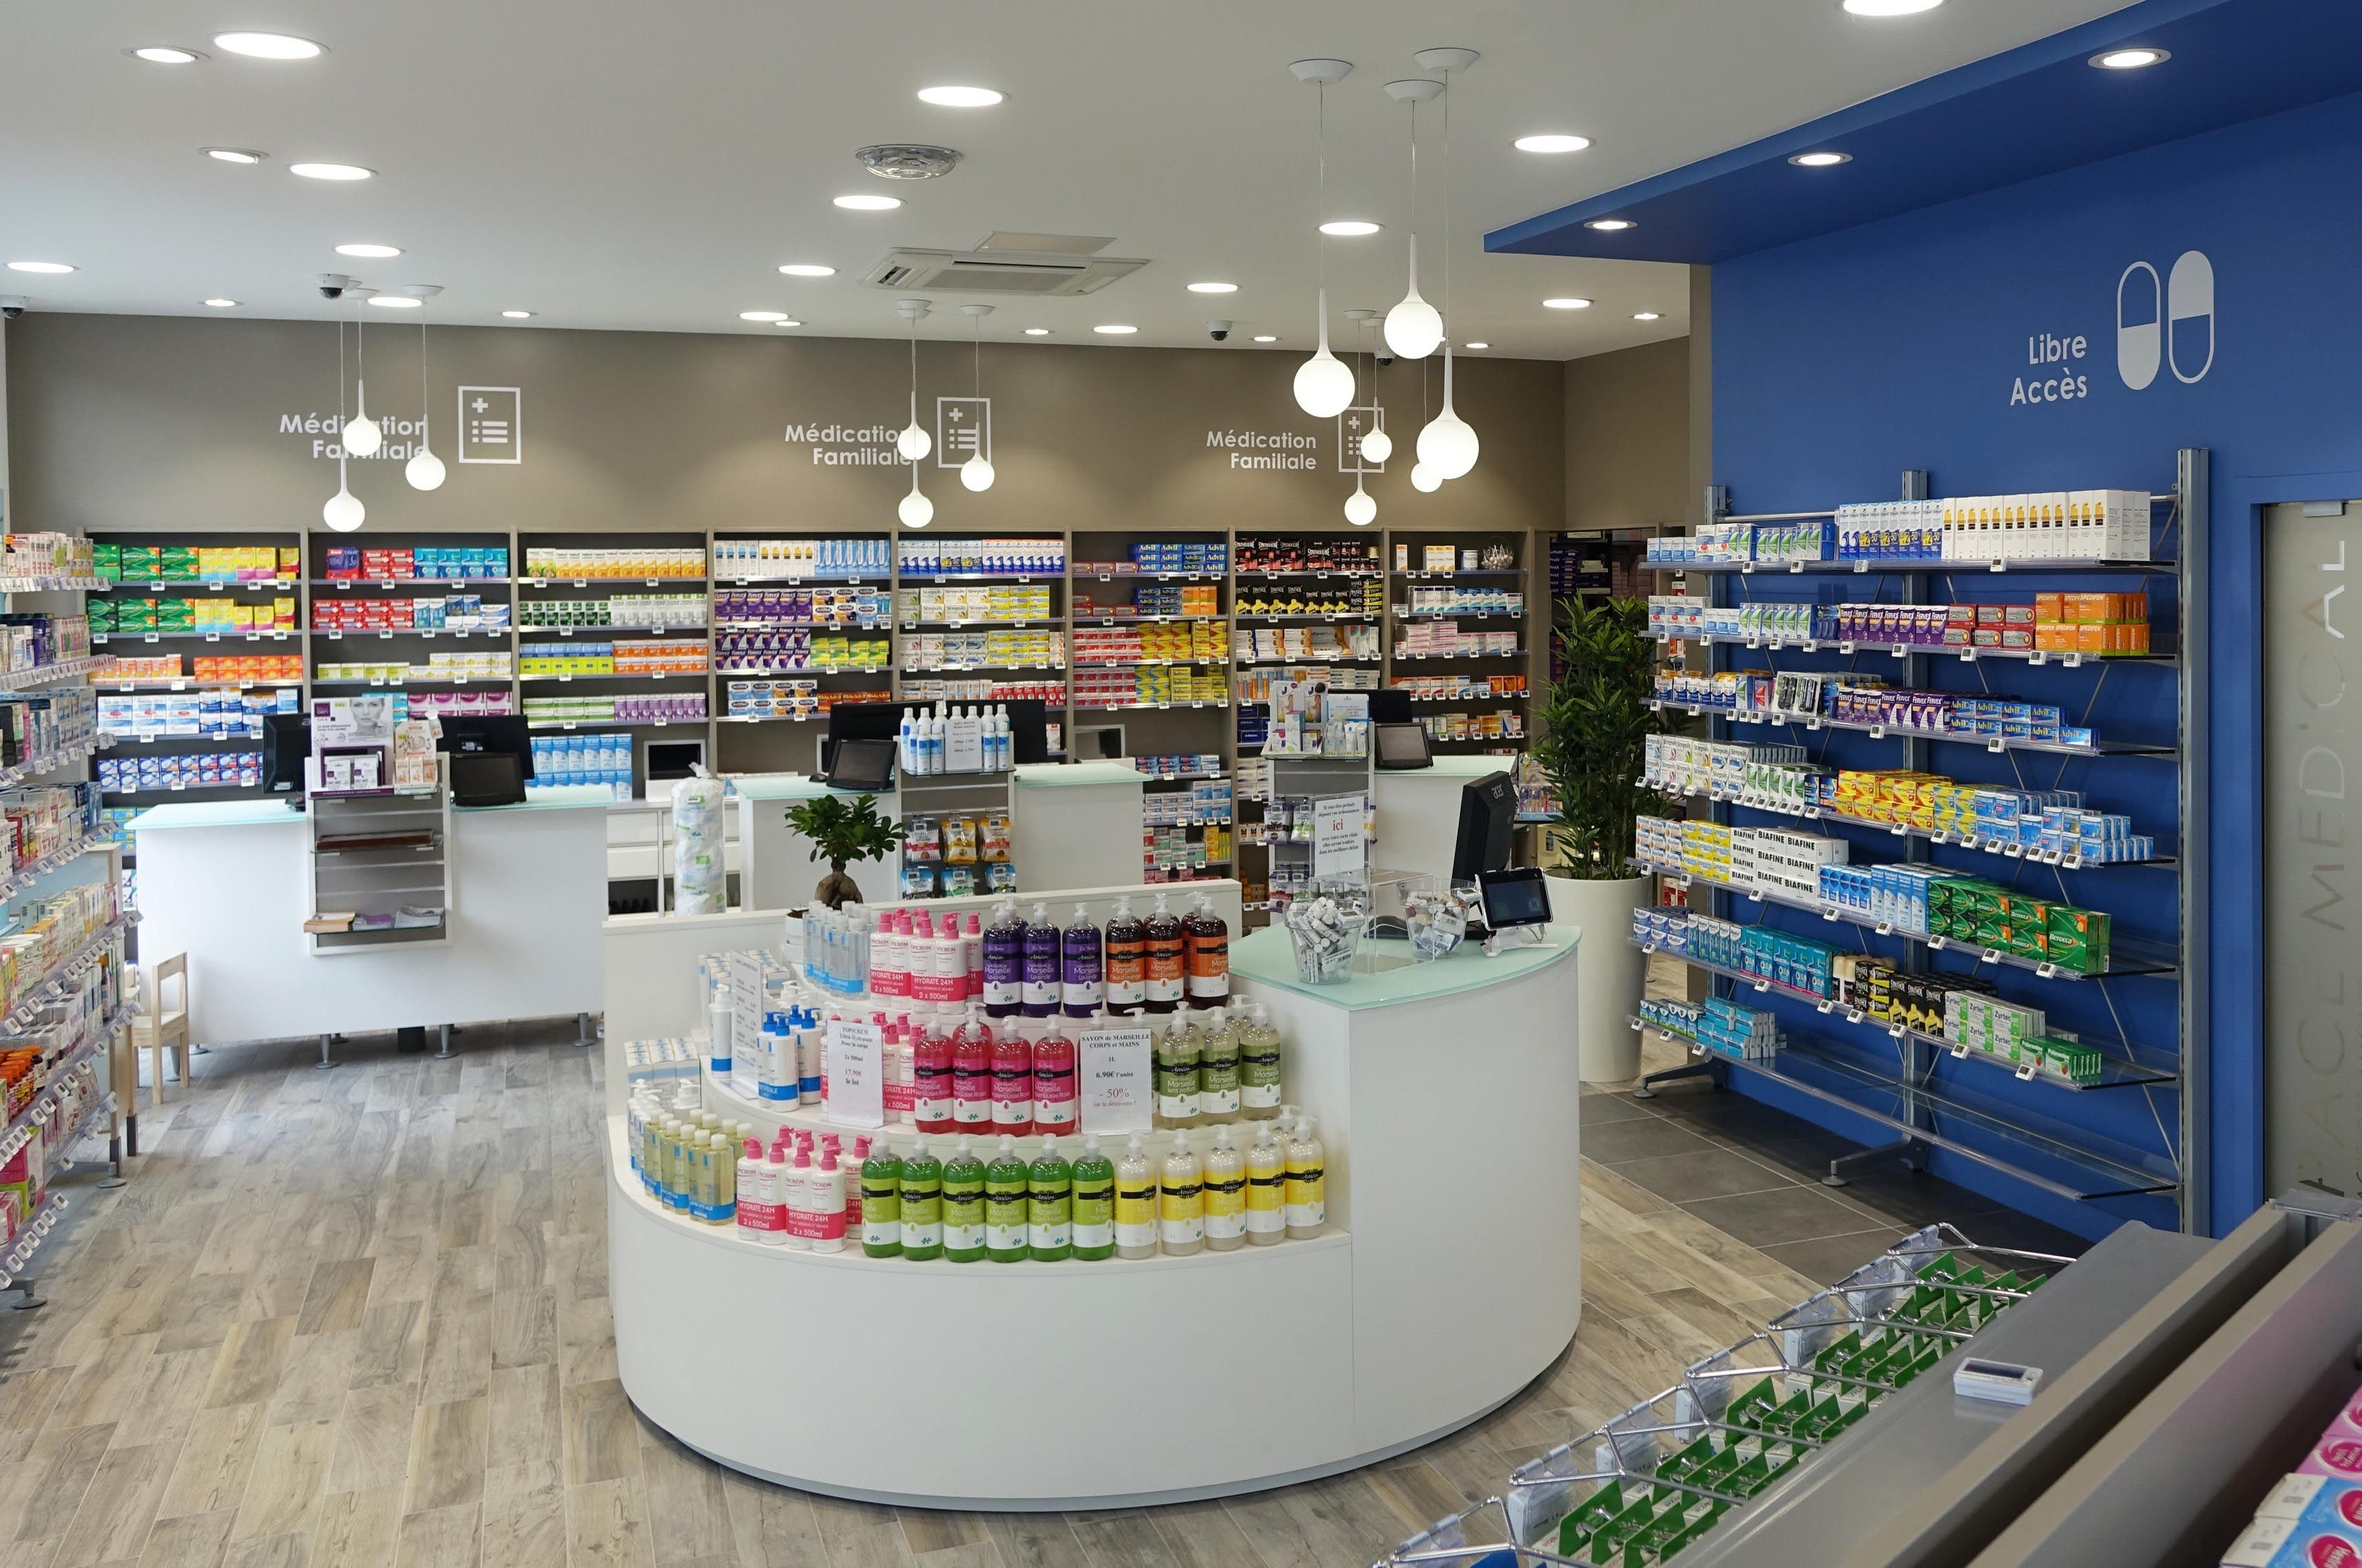 Pharmacie Des Amonts Ulice France Th Kohl Furnitures In  # Kohl Muebles Farmacia